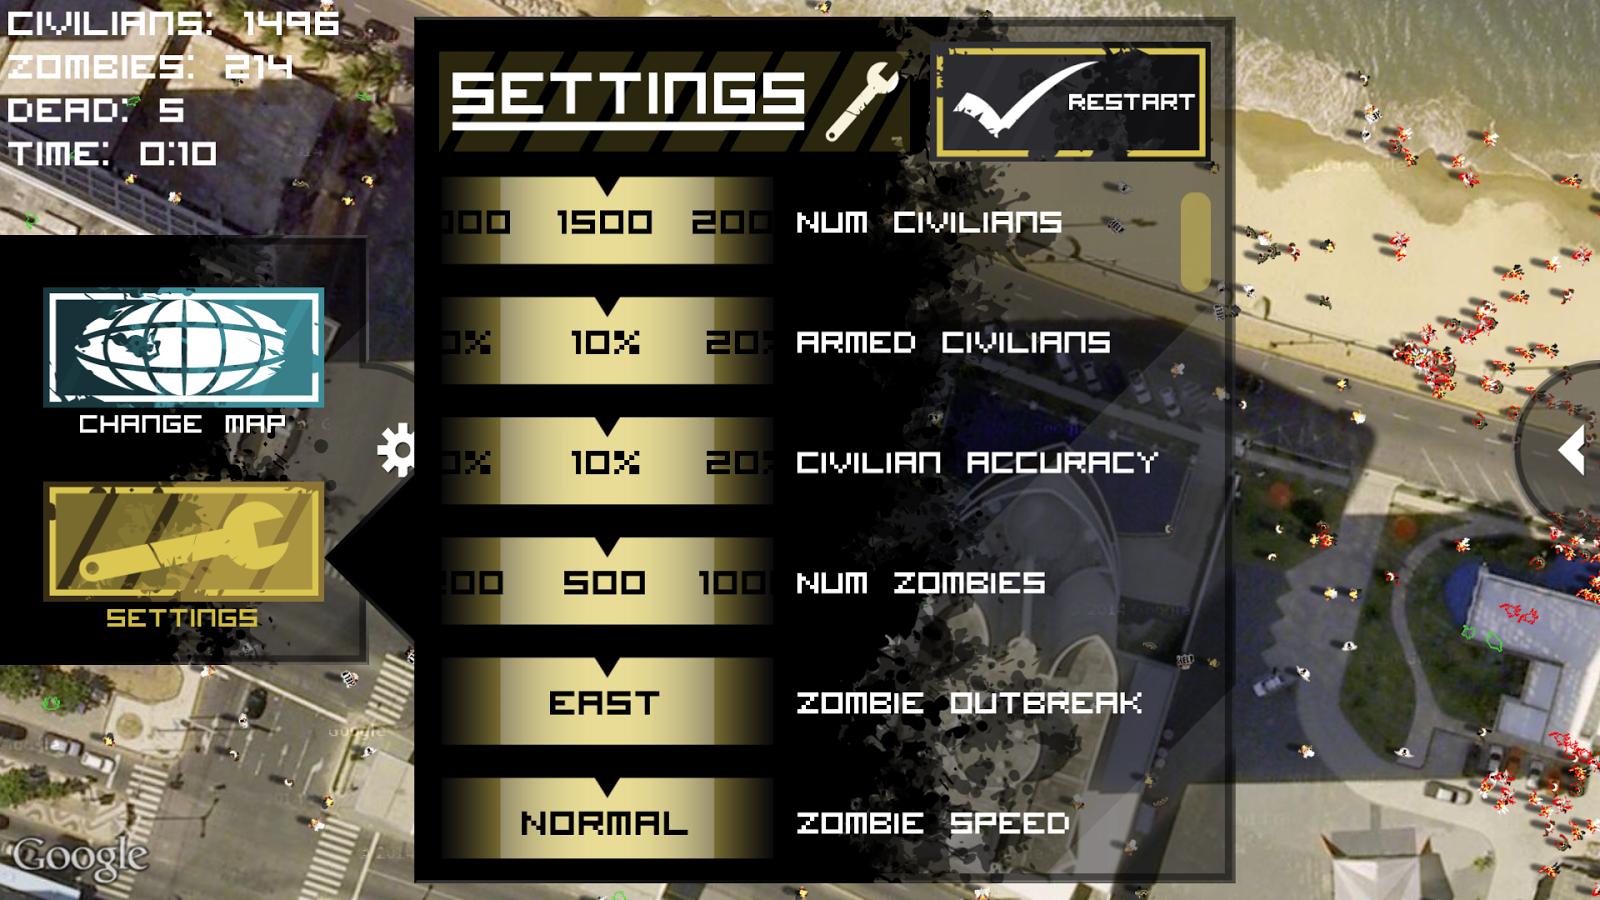 Zombie-Outbreak-Simulator 28